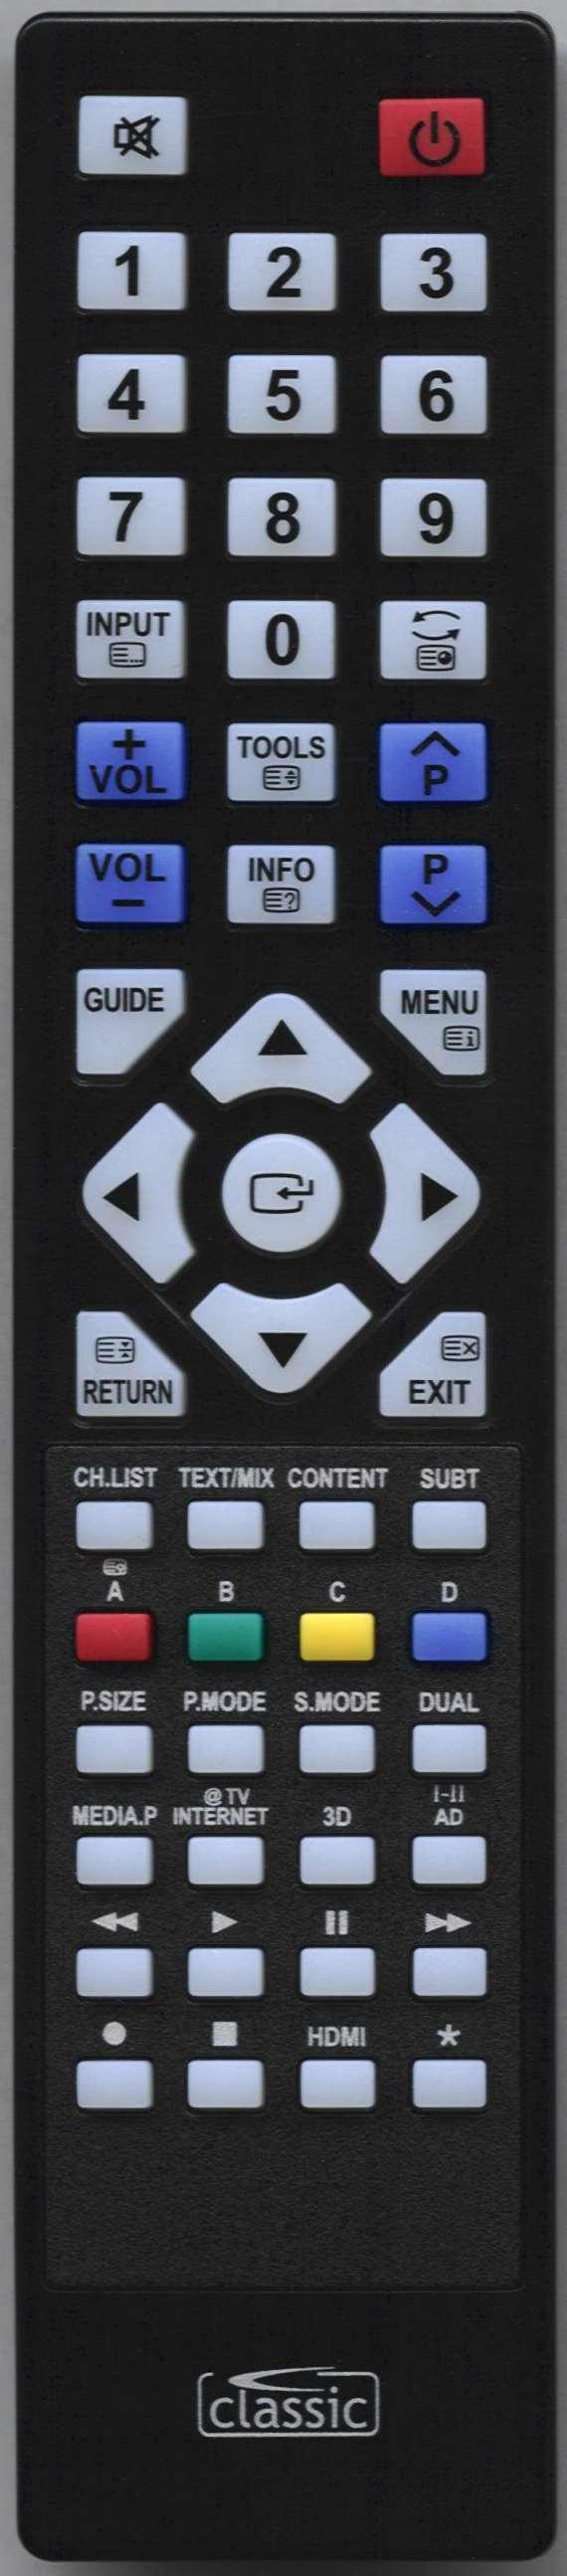 SAMSUNG BN59-01012A Remote Control Alternative